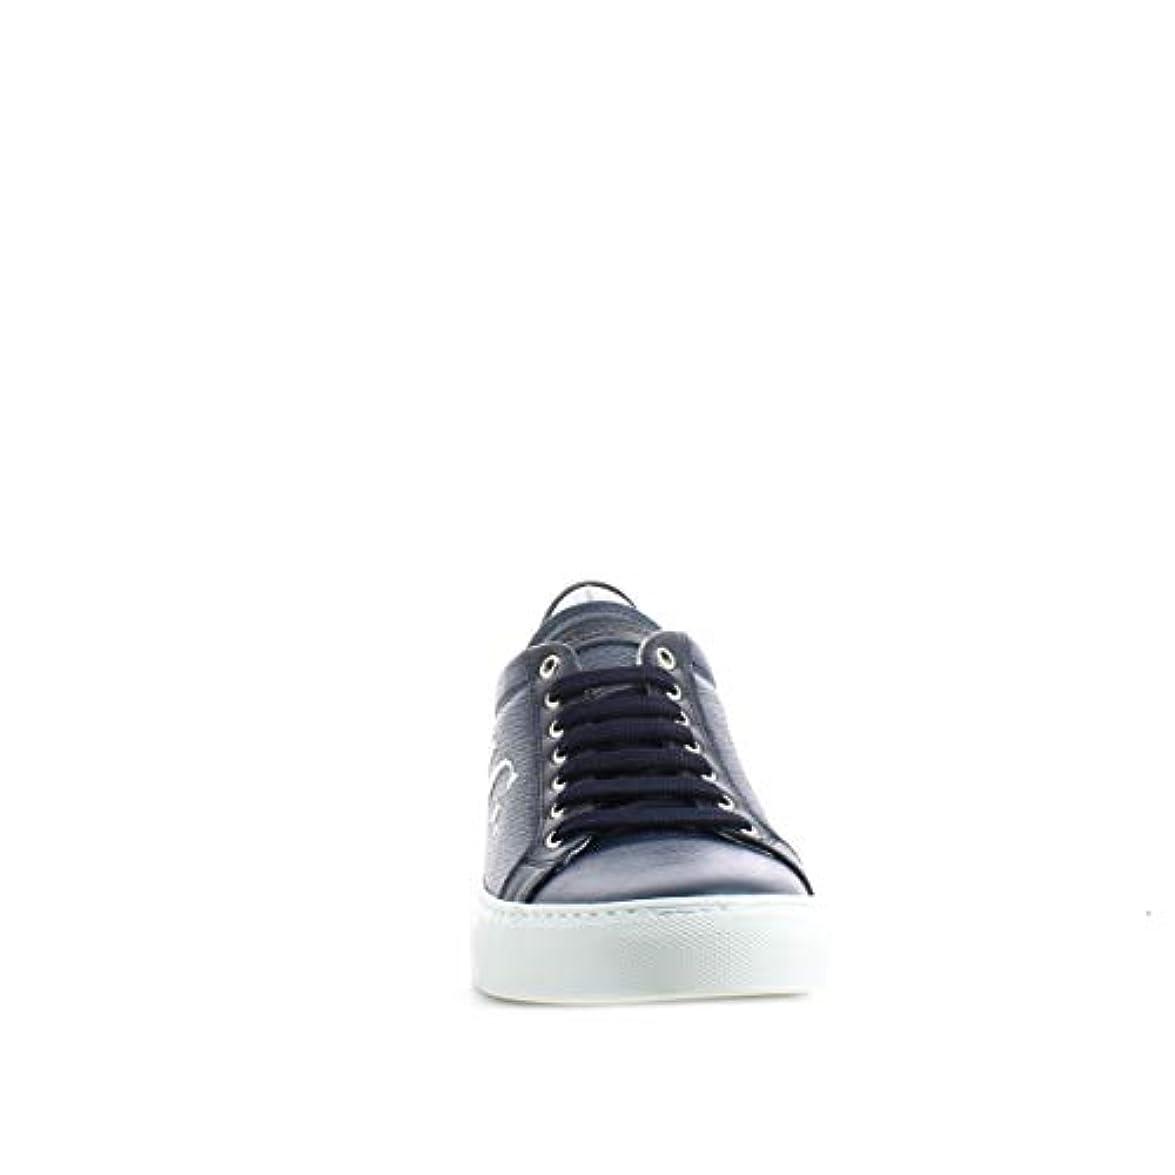 John Galliano Paris Sneaker